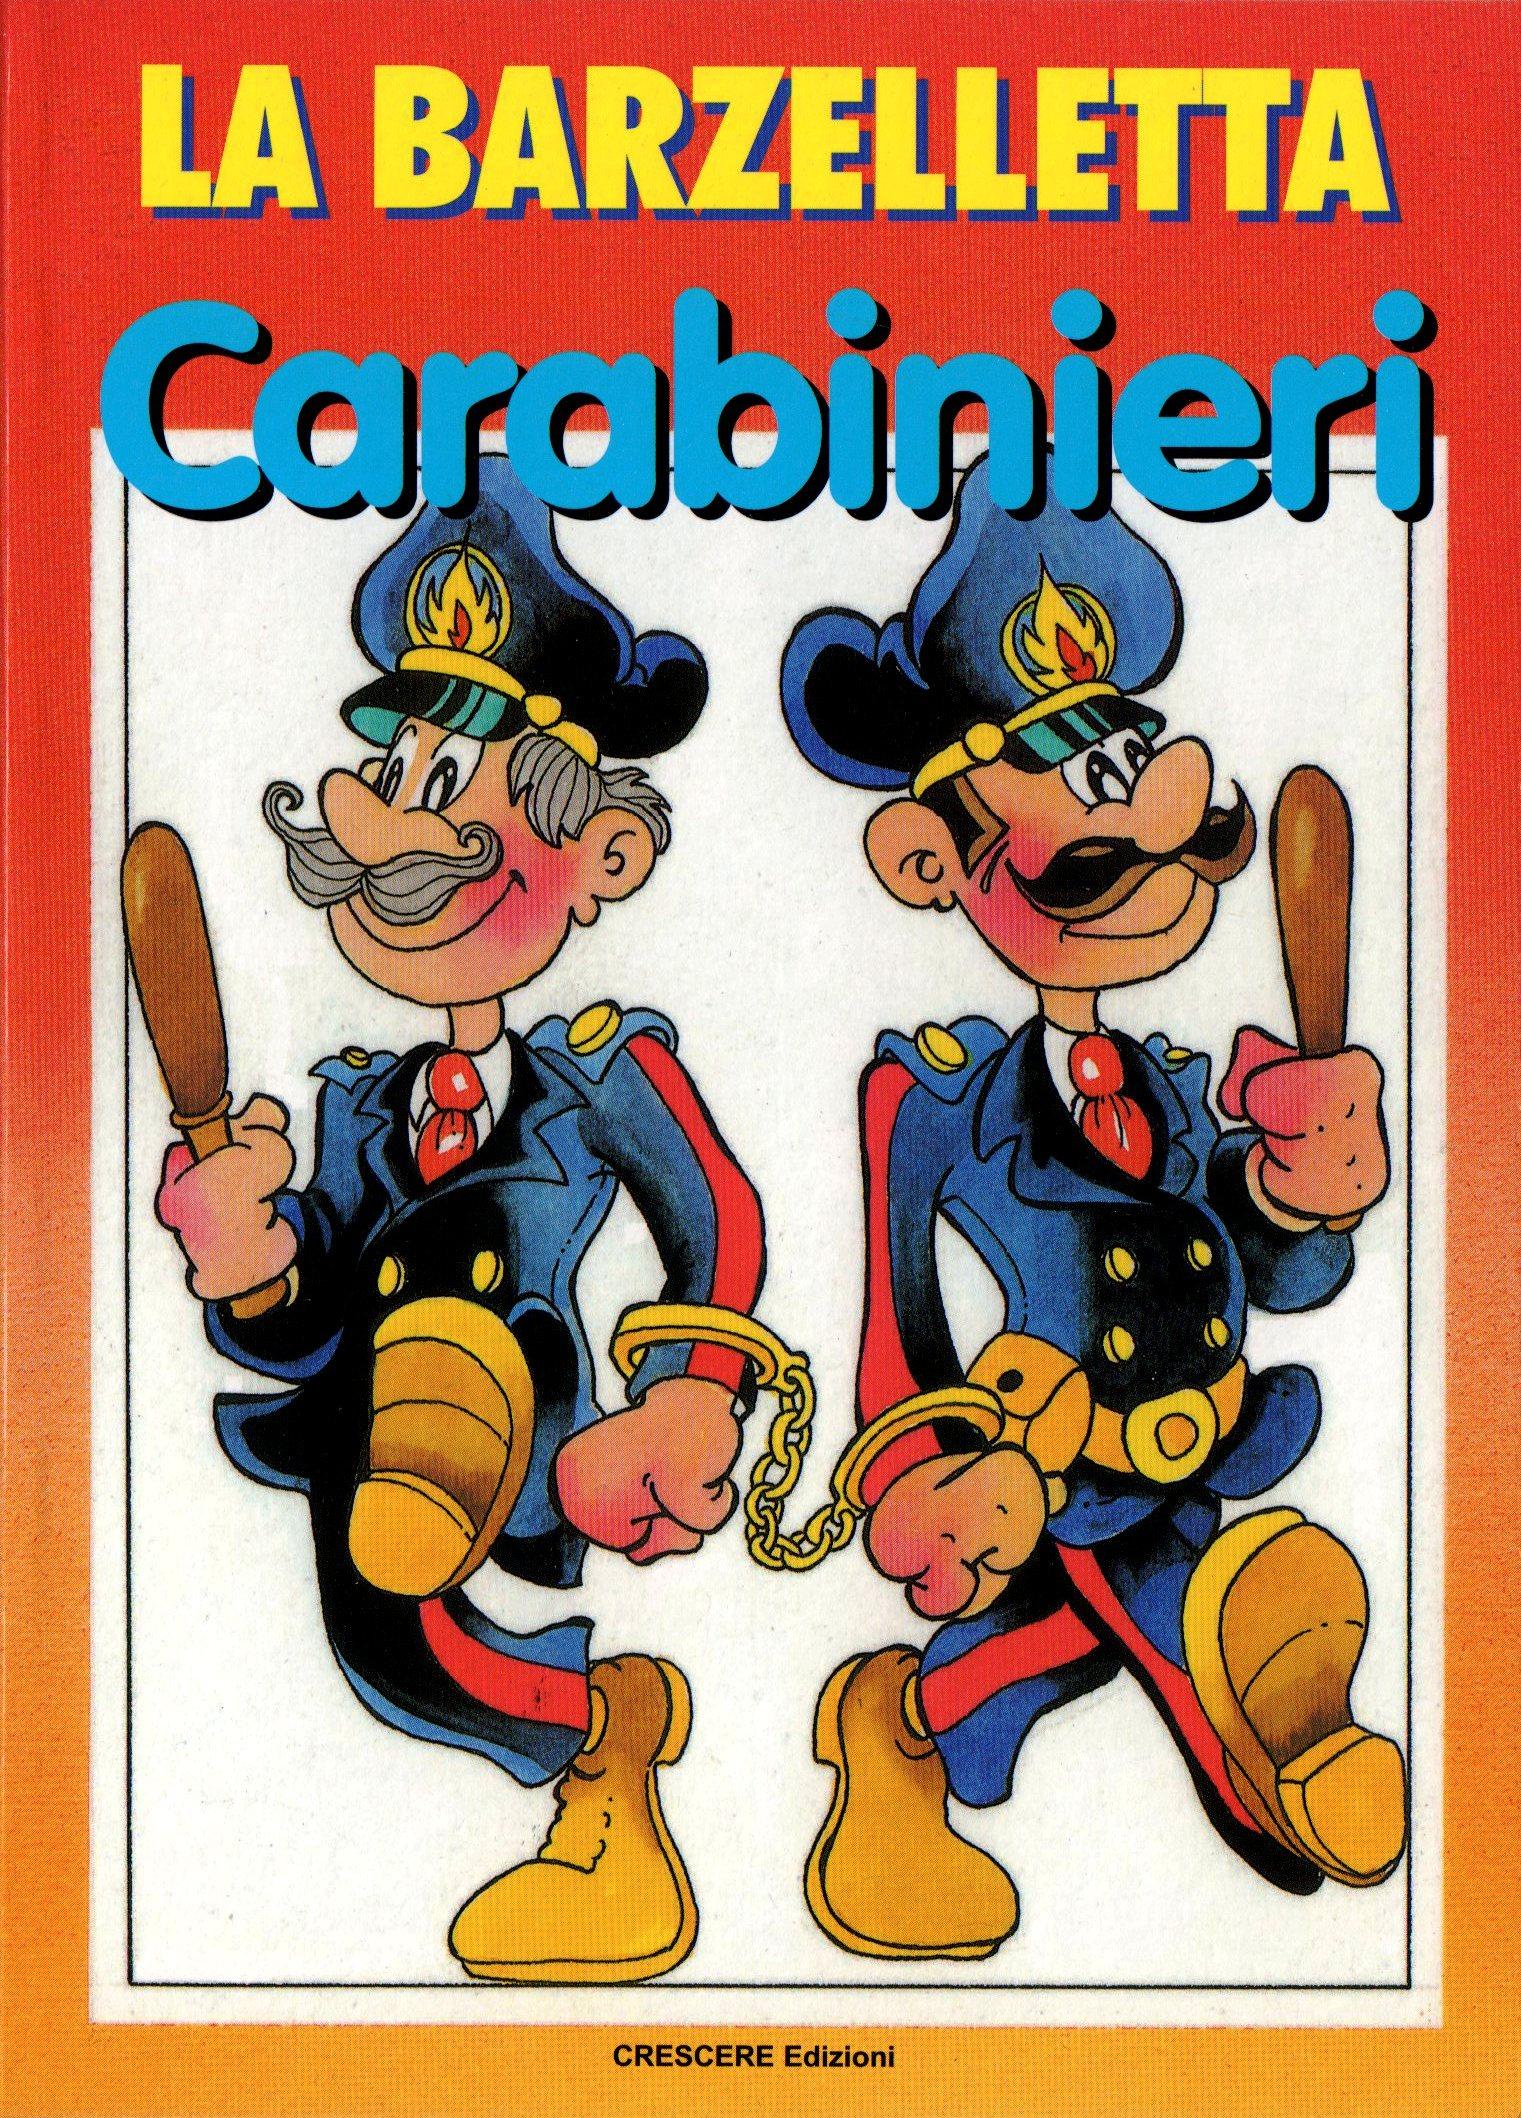 La barzelletta. Carabinieri